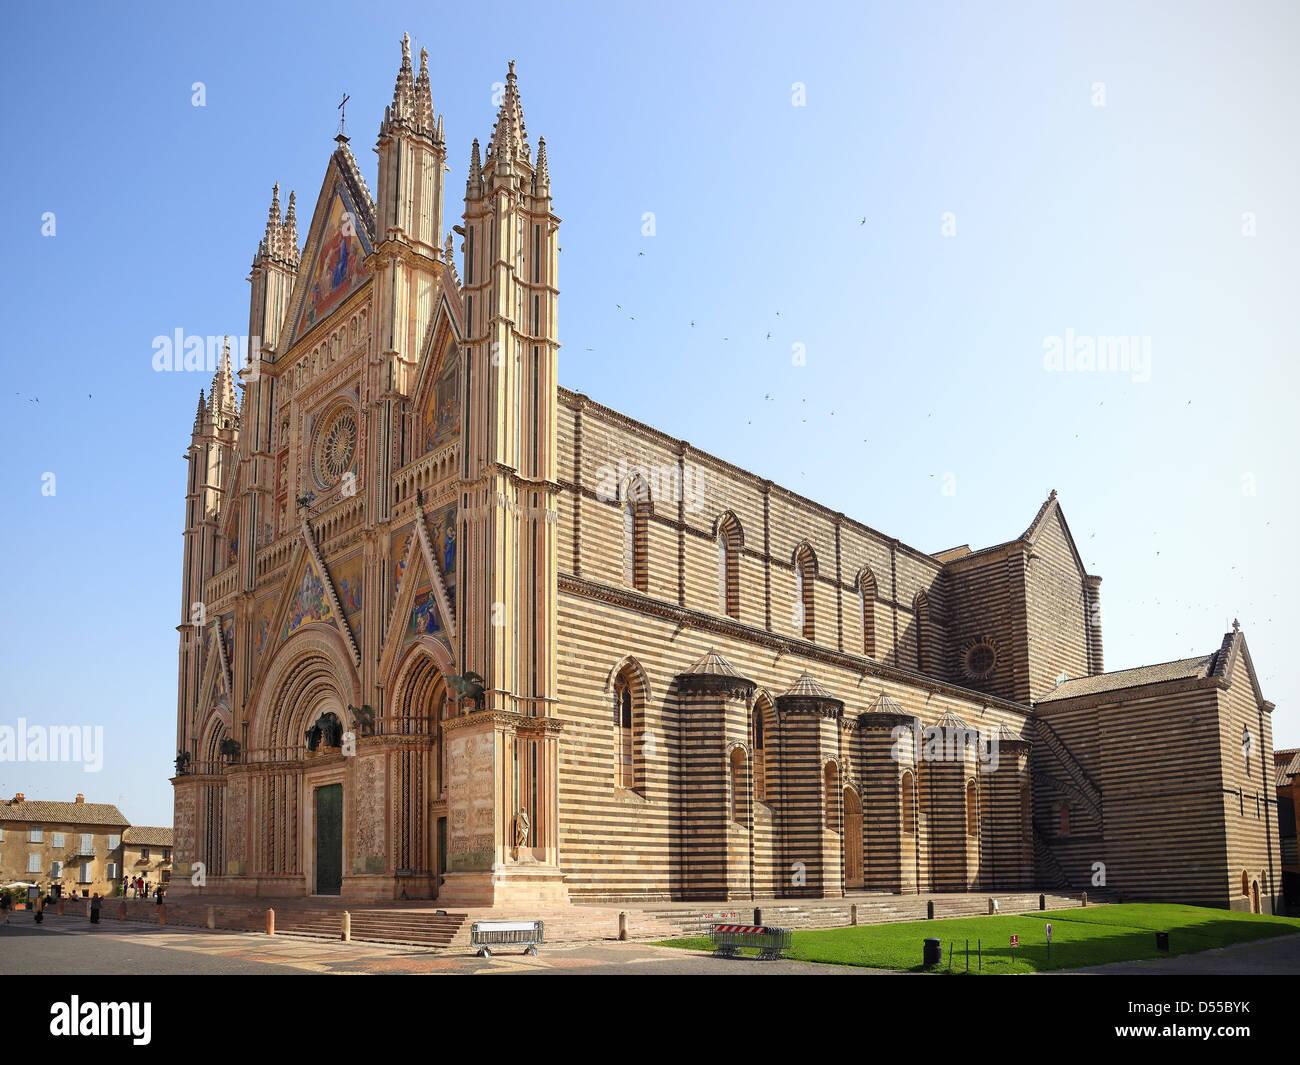 Duomo di Orvieto,cathedral. Decorated facade, Umbria, Italy - Stock Image